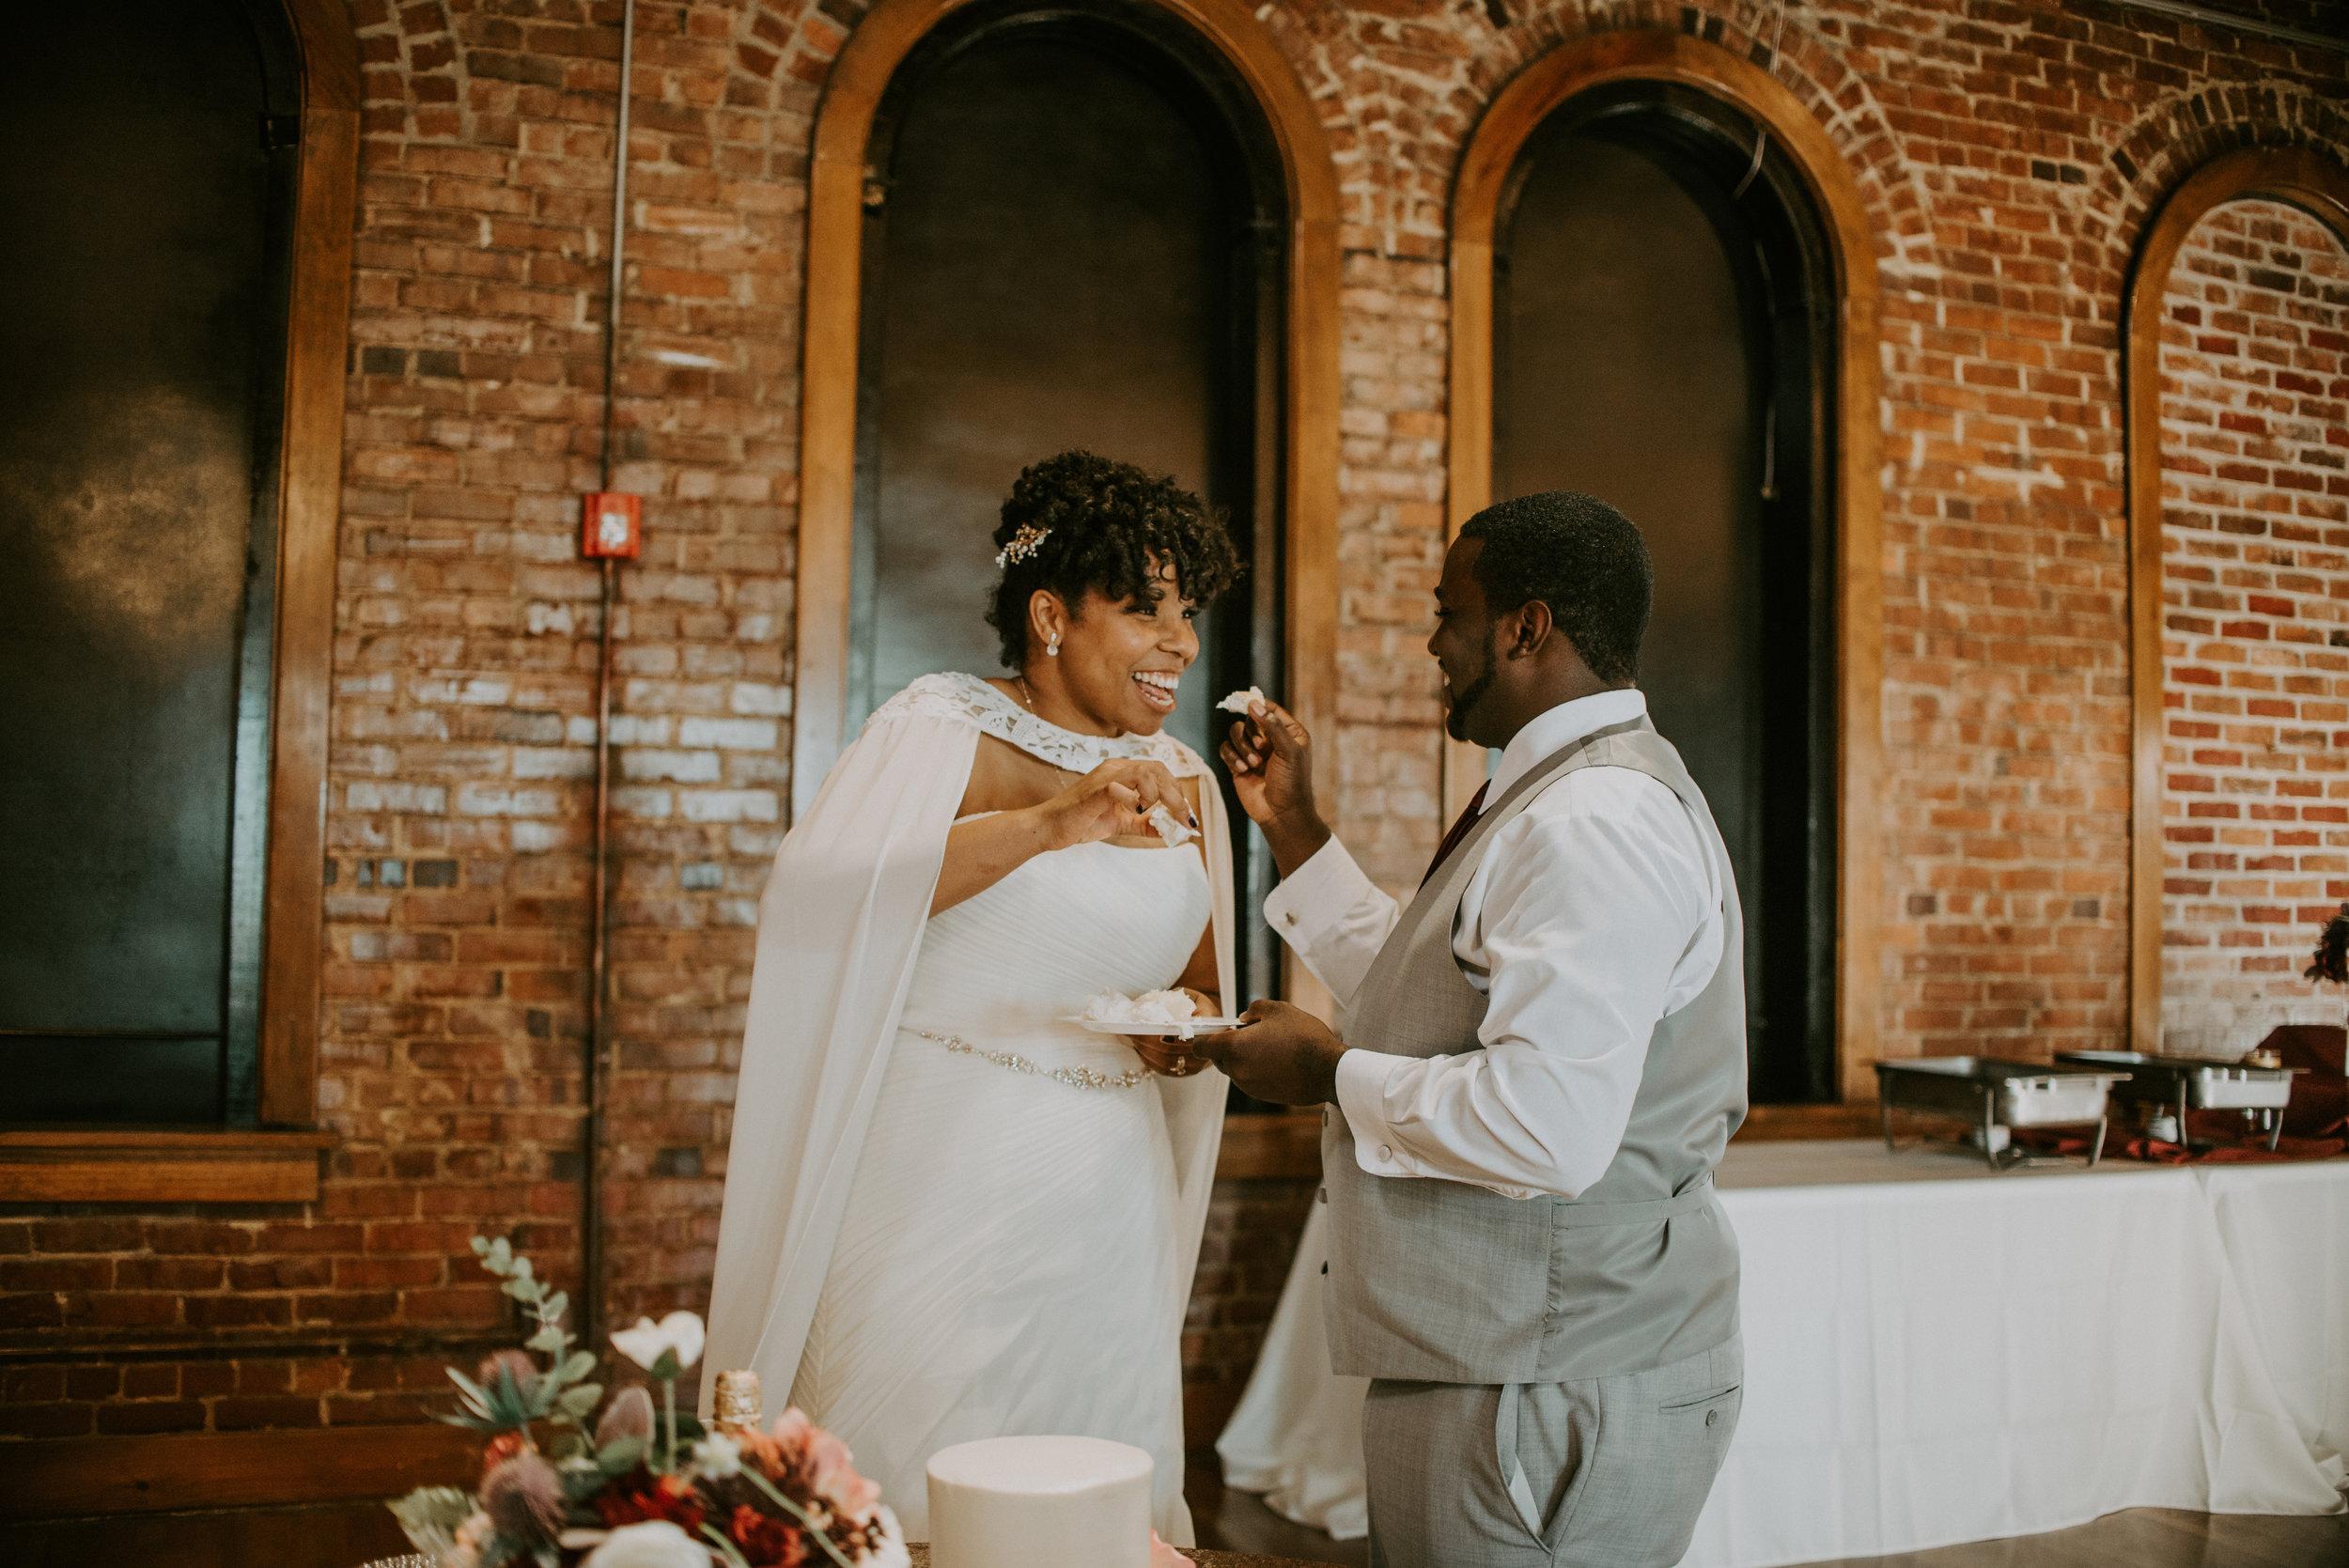 WonderlyCreative_Wedding_6.7.18_Khara&Dwayne_-913.jpg